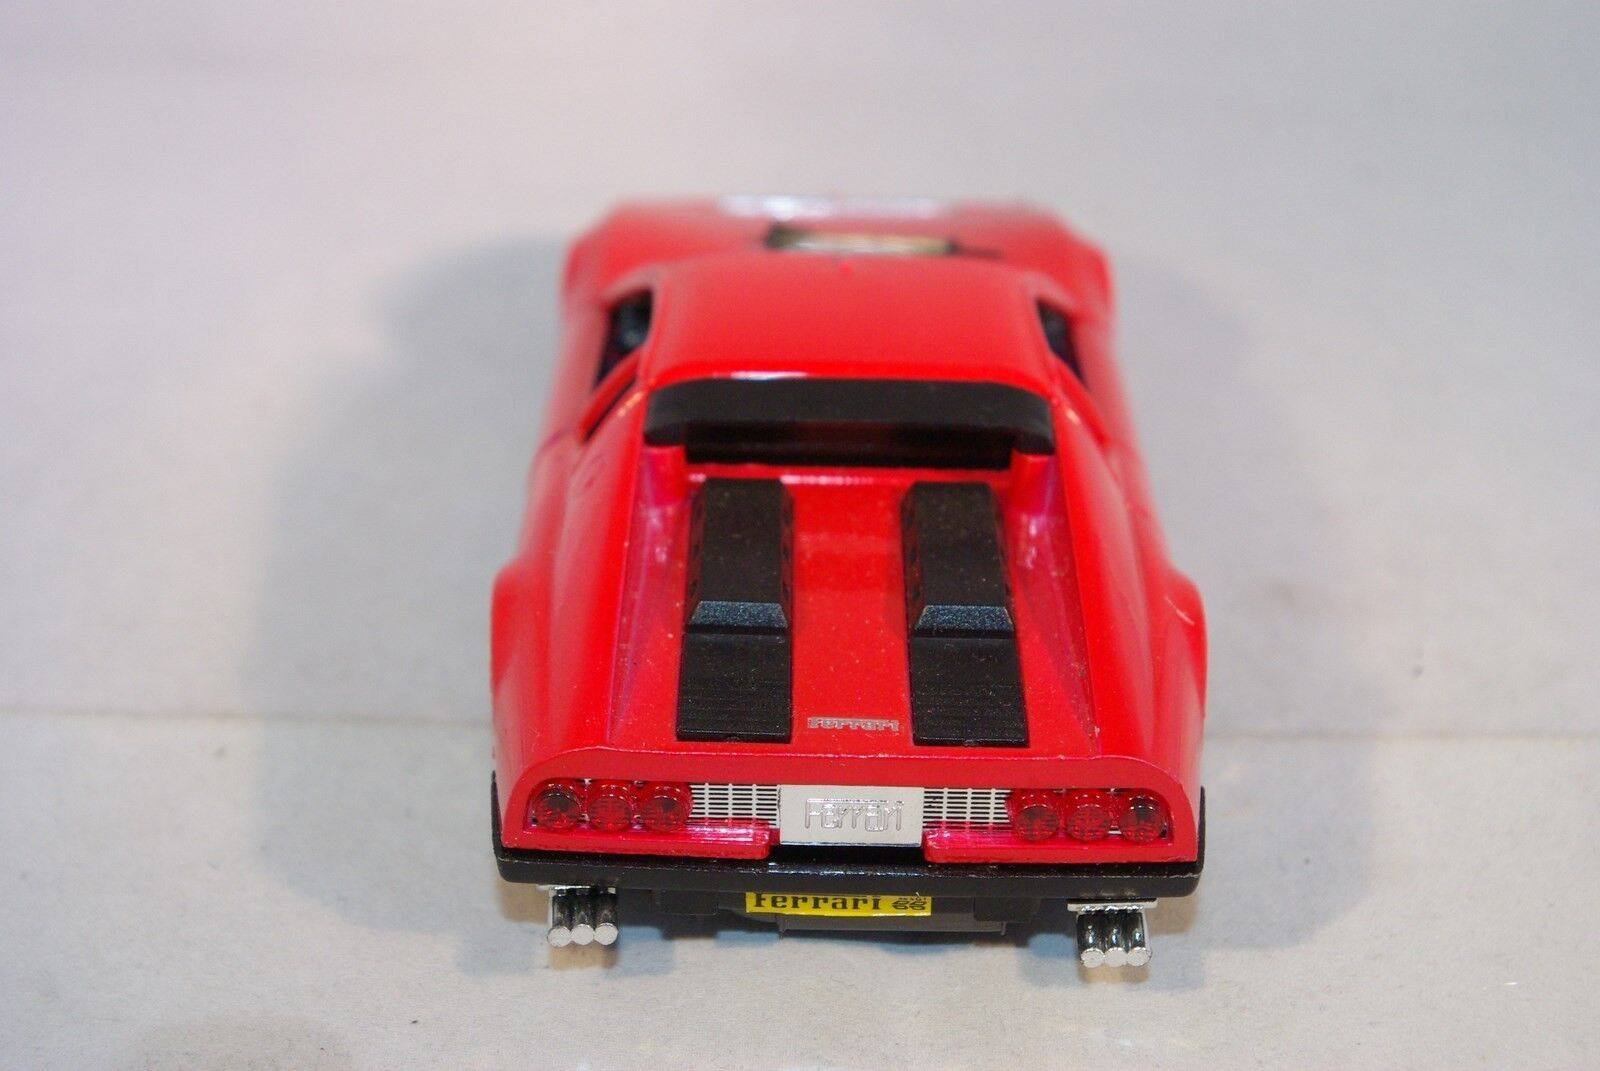 EIDAI GRIP FERRARI 365 GTBB 365GTBB BERLINETTA BOXER RED RED RED MINT RARE 1ddac4